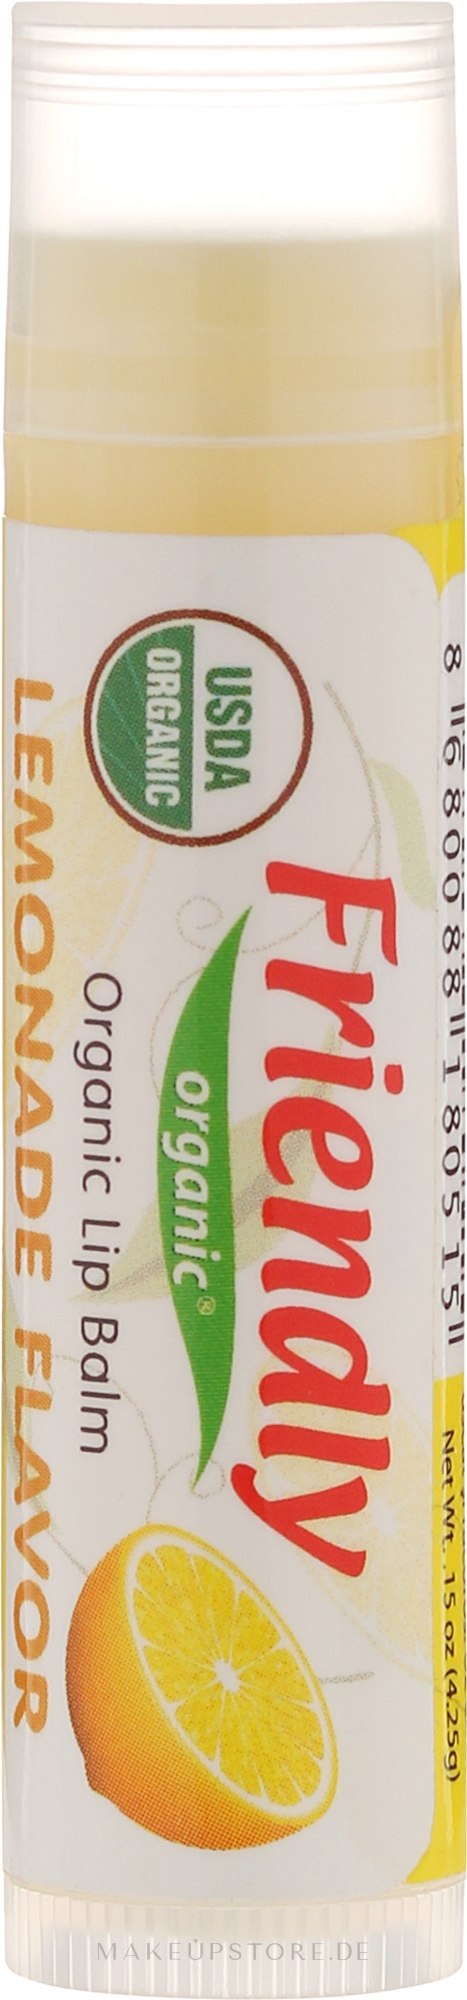 "Bio-Lippenbalsam ""Limonade"" - Friendly Organic Lip Balm Lemonade — Bild 4.25 g"